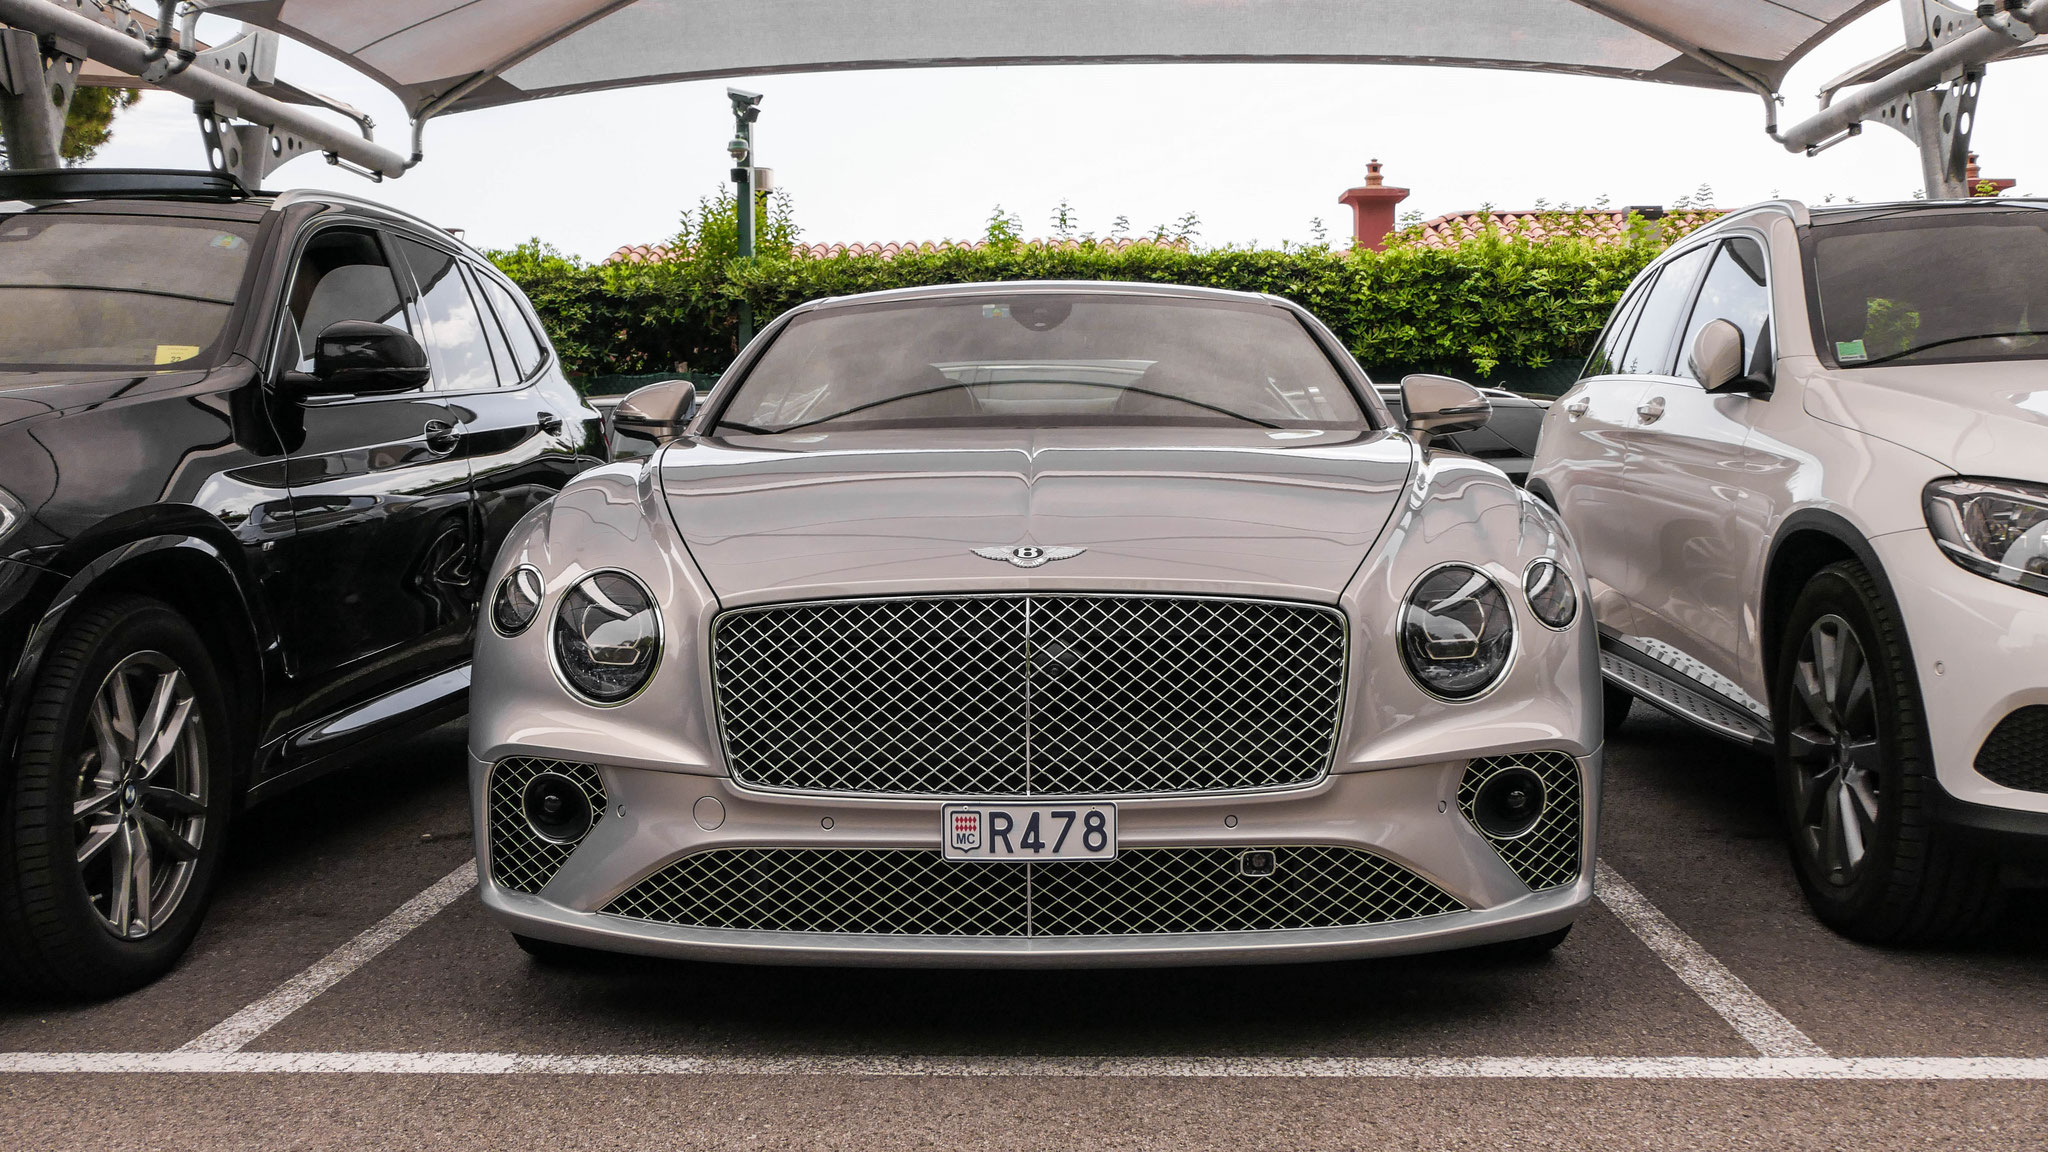 Bentley Continental GT - R478 (MC)